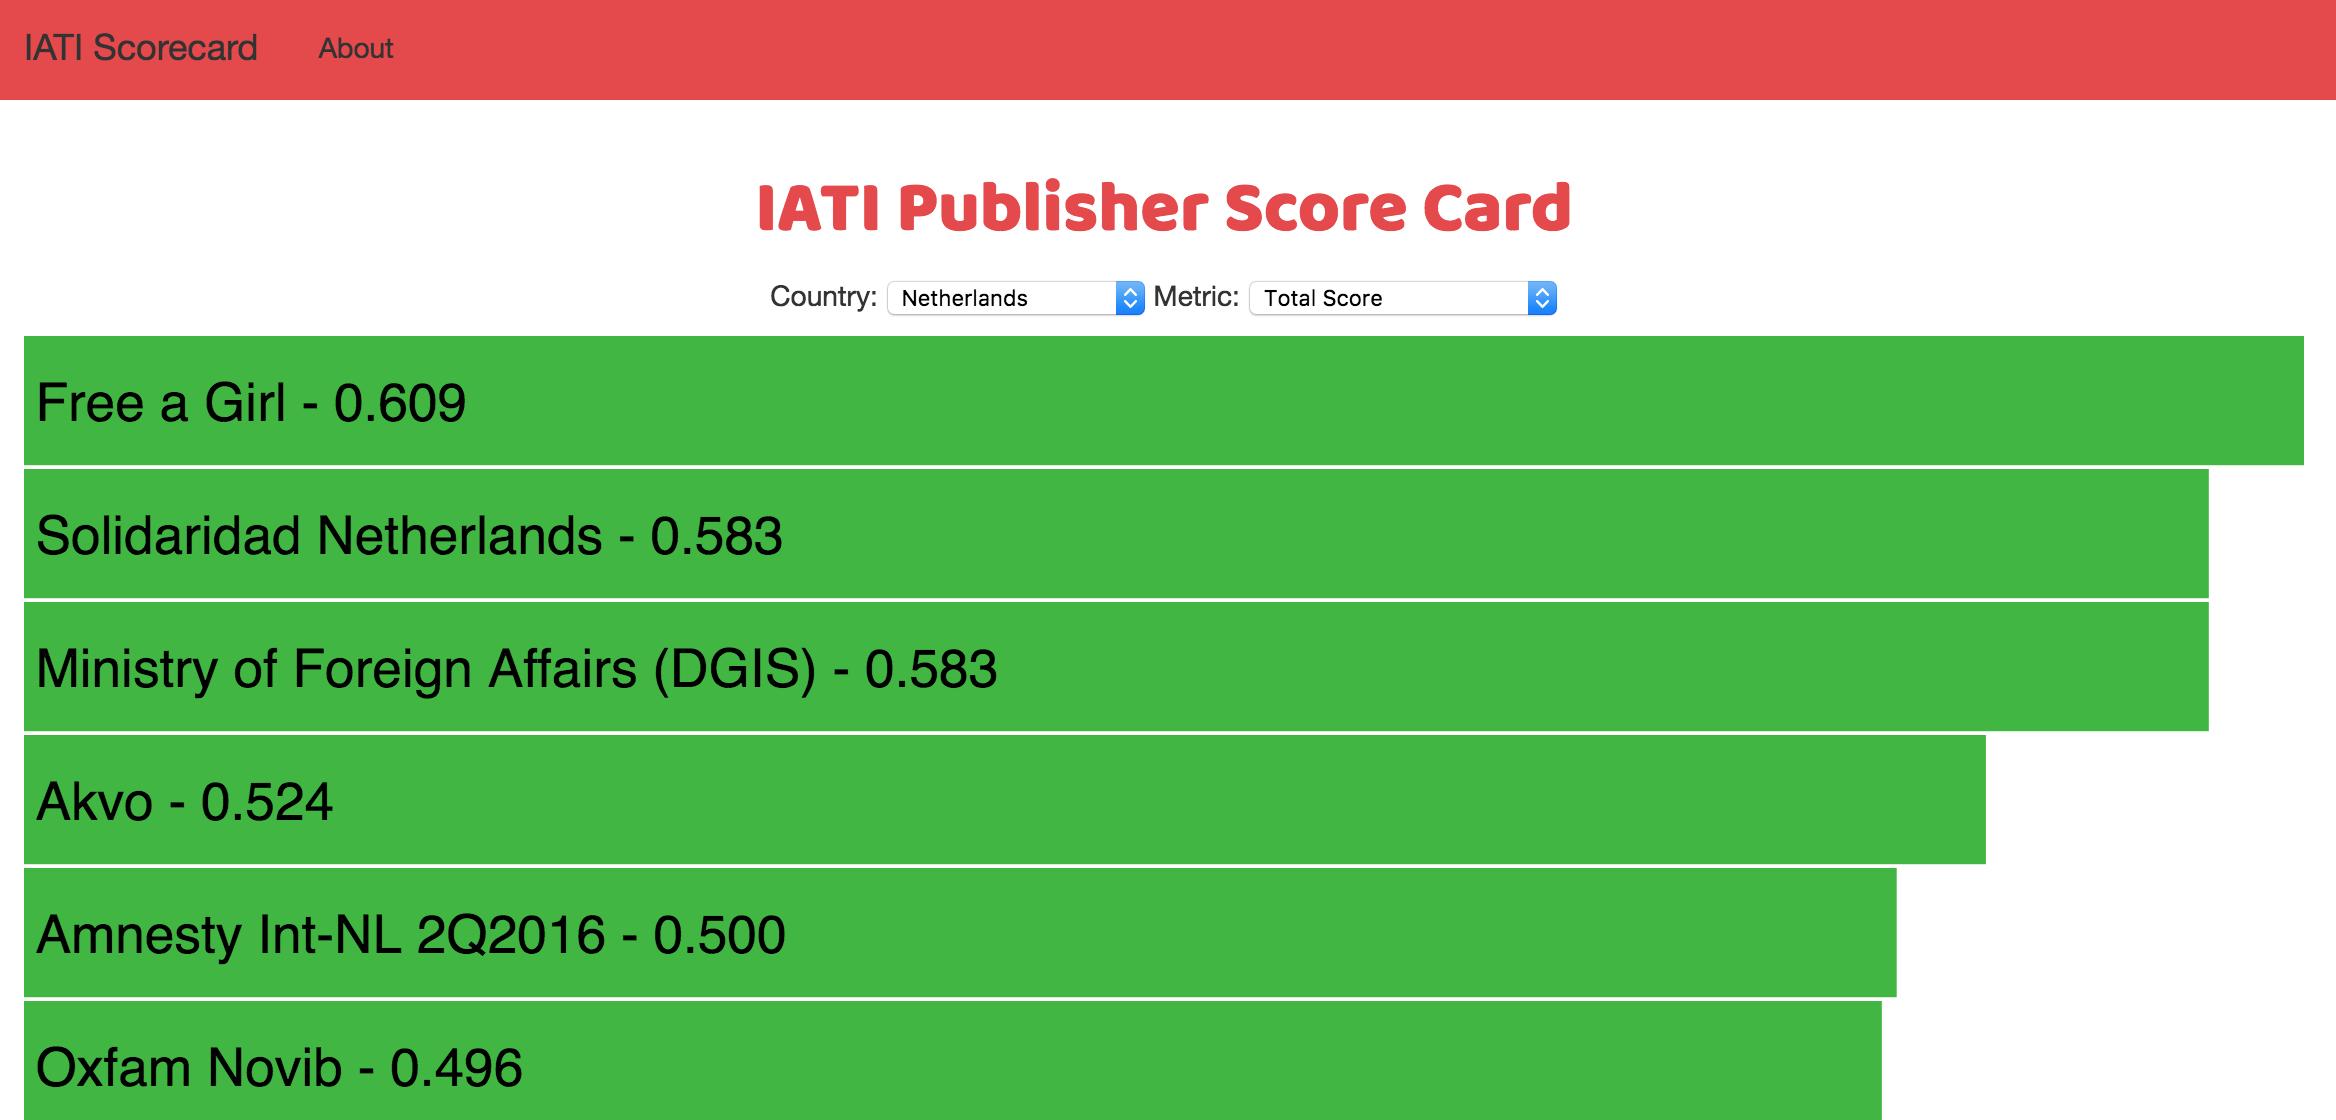 IATI Score Card 2016-10-12 10-34-40